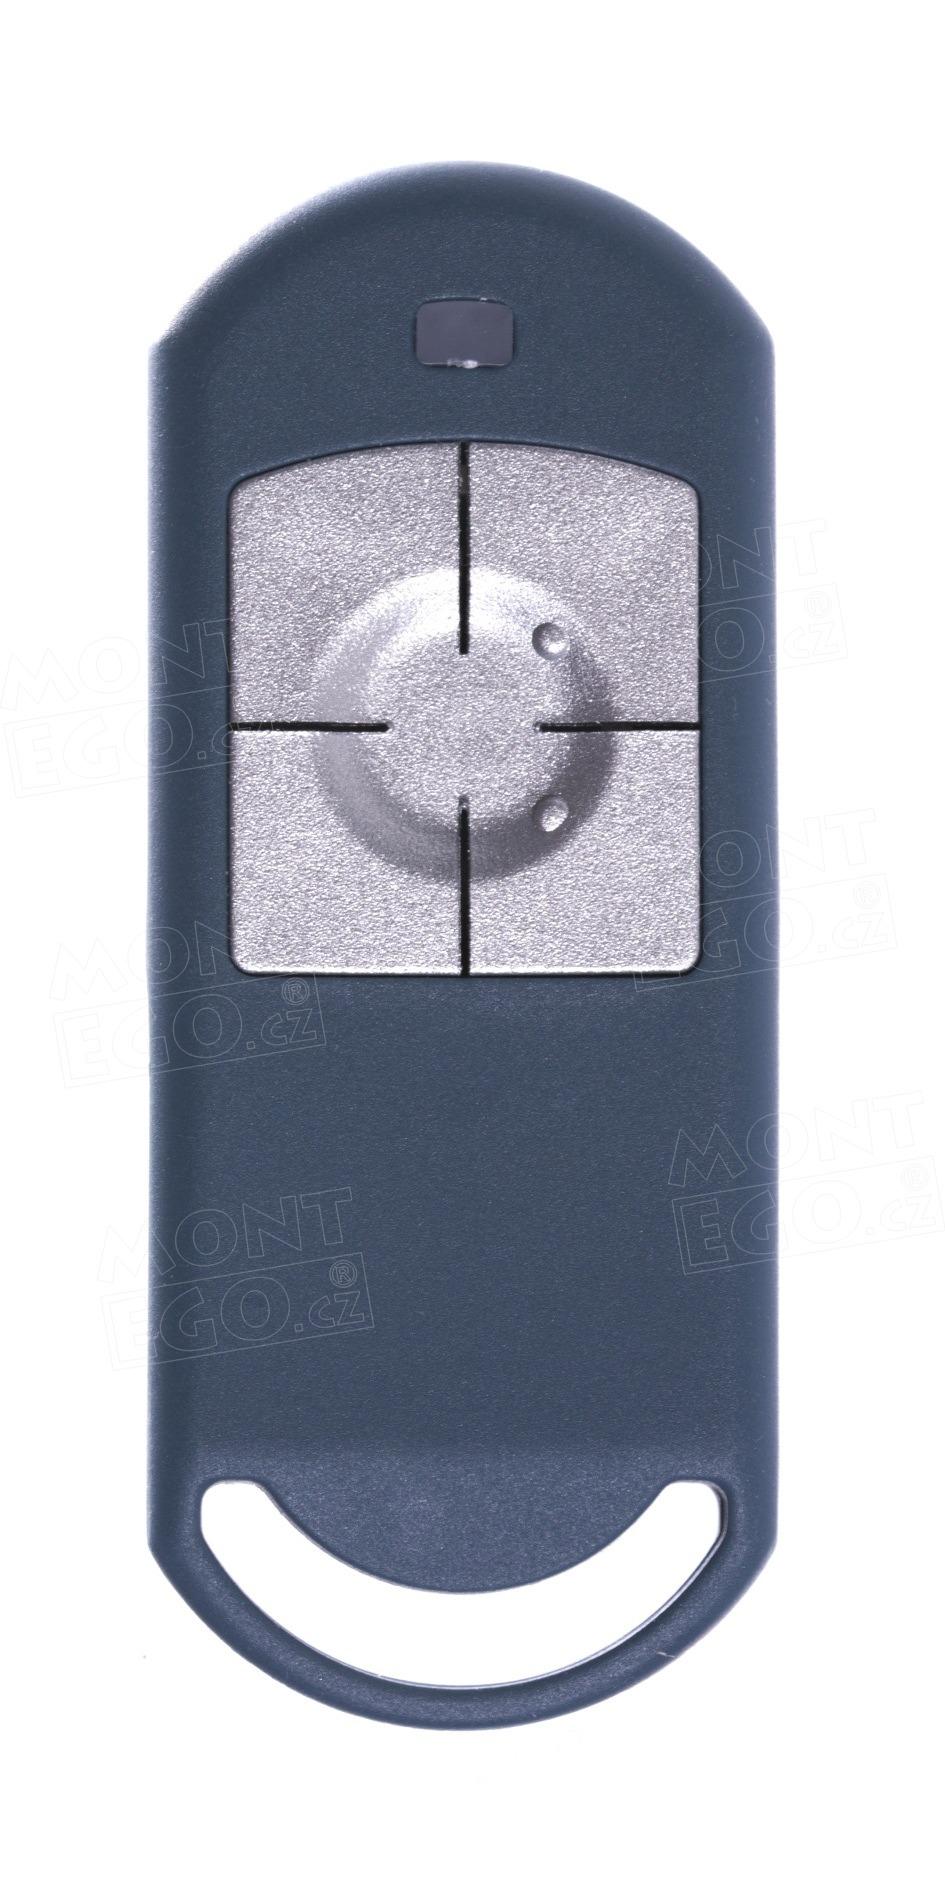 Tx Cross 4 Enika kapesní miniovladač 4kanálový